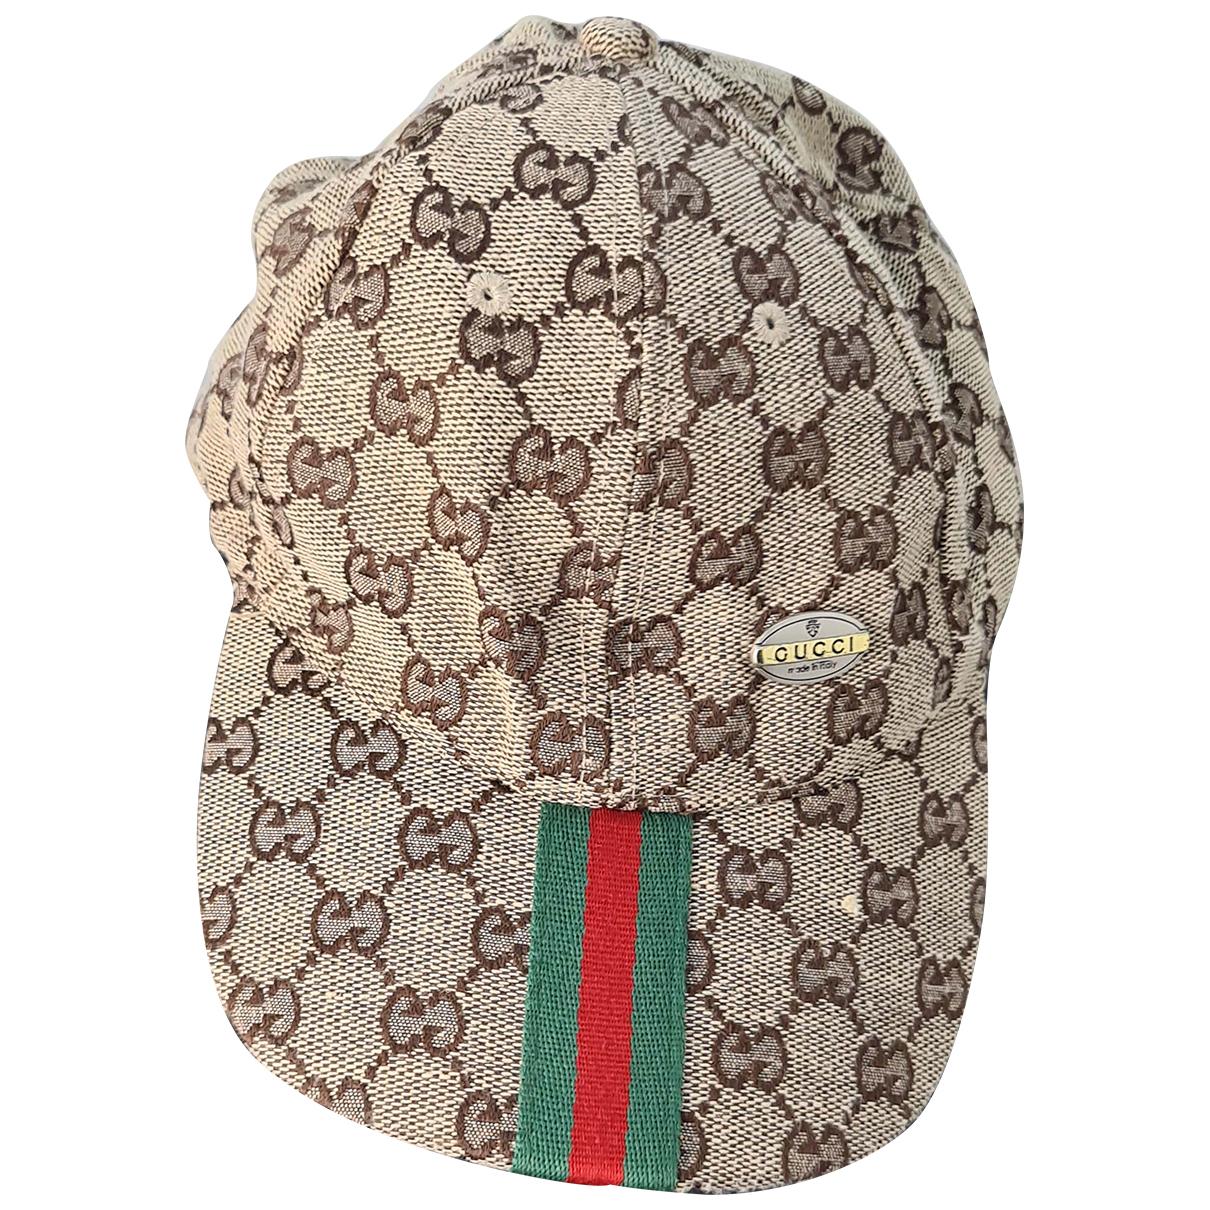 Gucci N Beige Cloth hat & pull on hat for Men M International